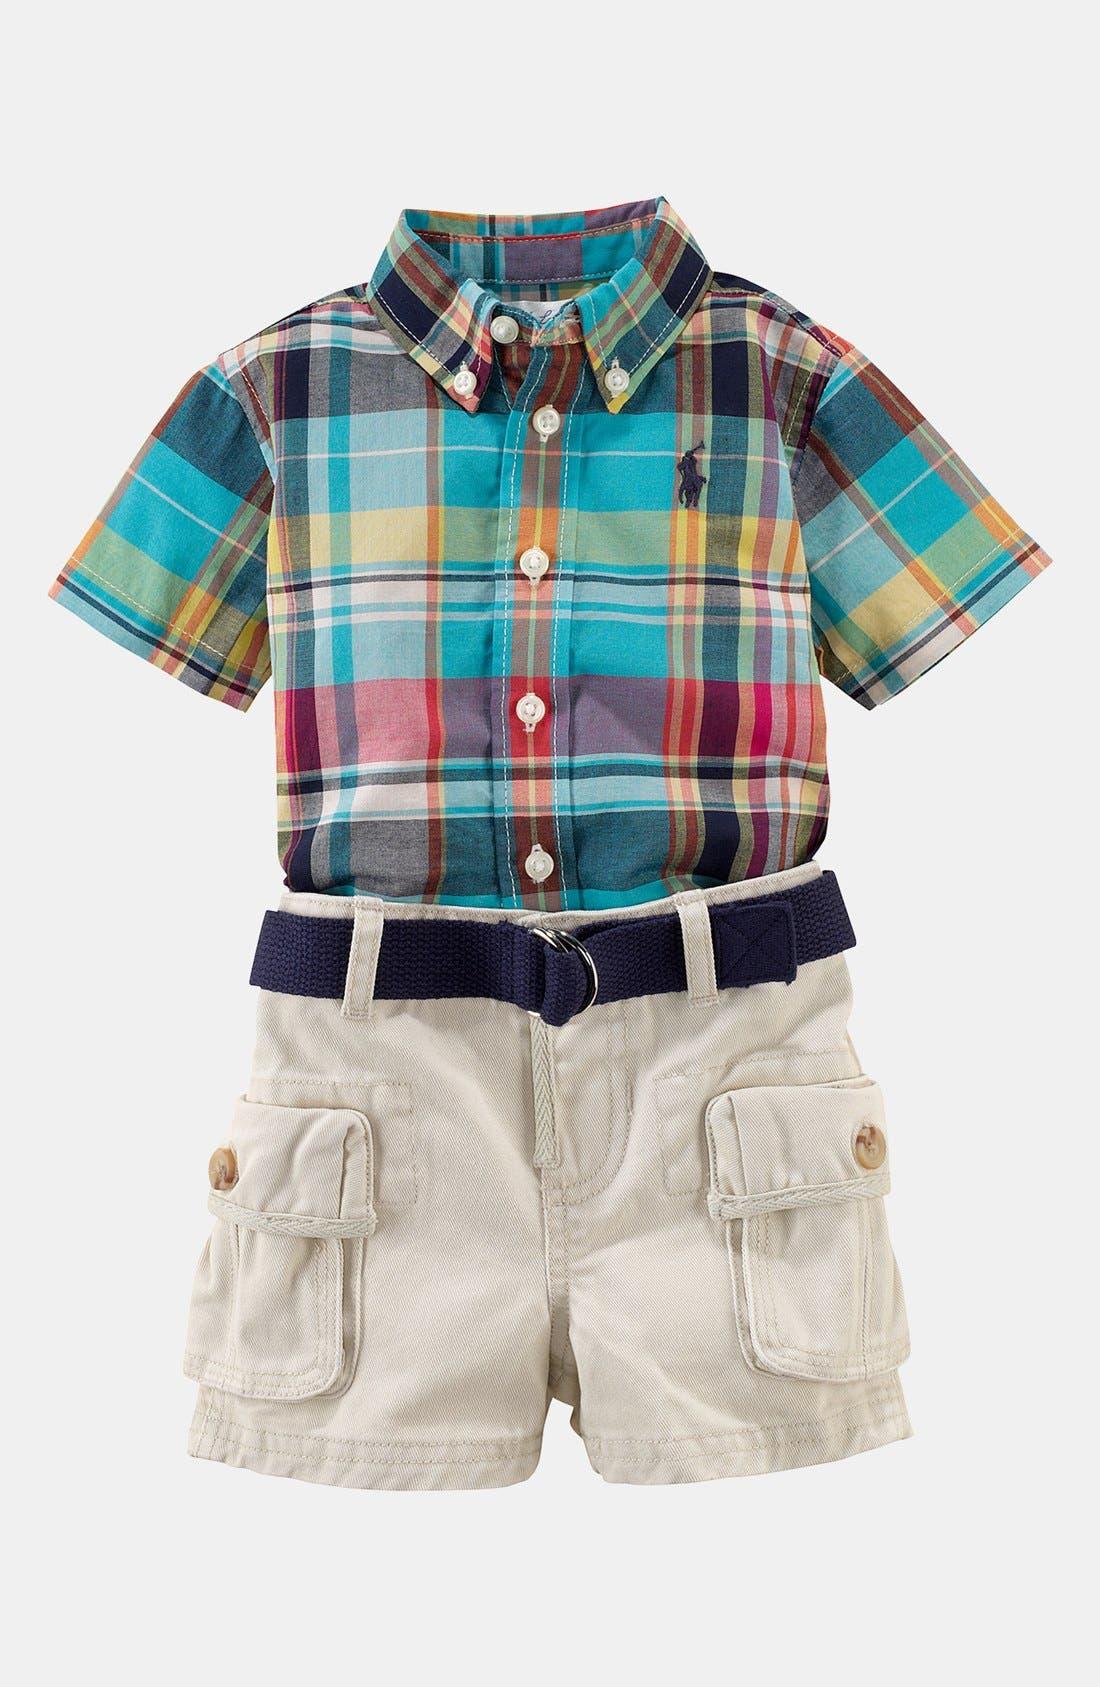 Alternate Image 1 Selected - Ralph Lauren Plaid Shirt & Shorts (Baby)